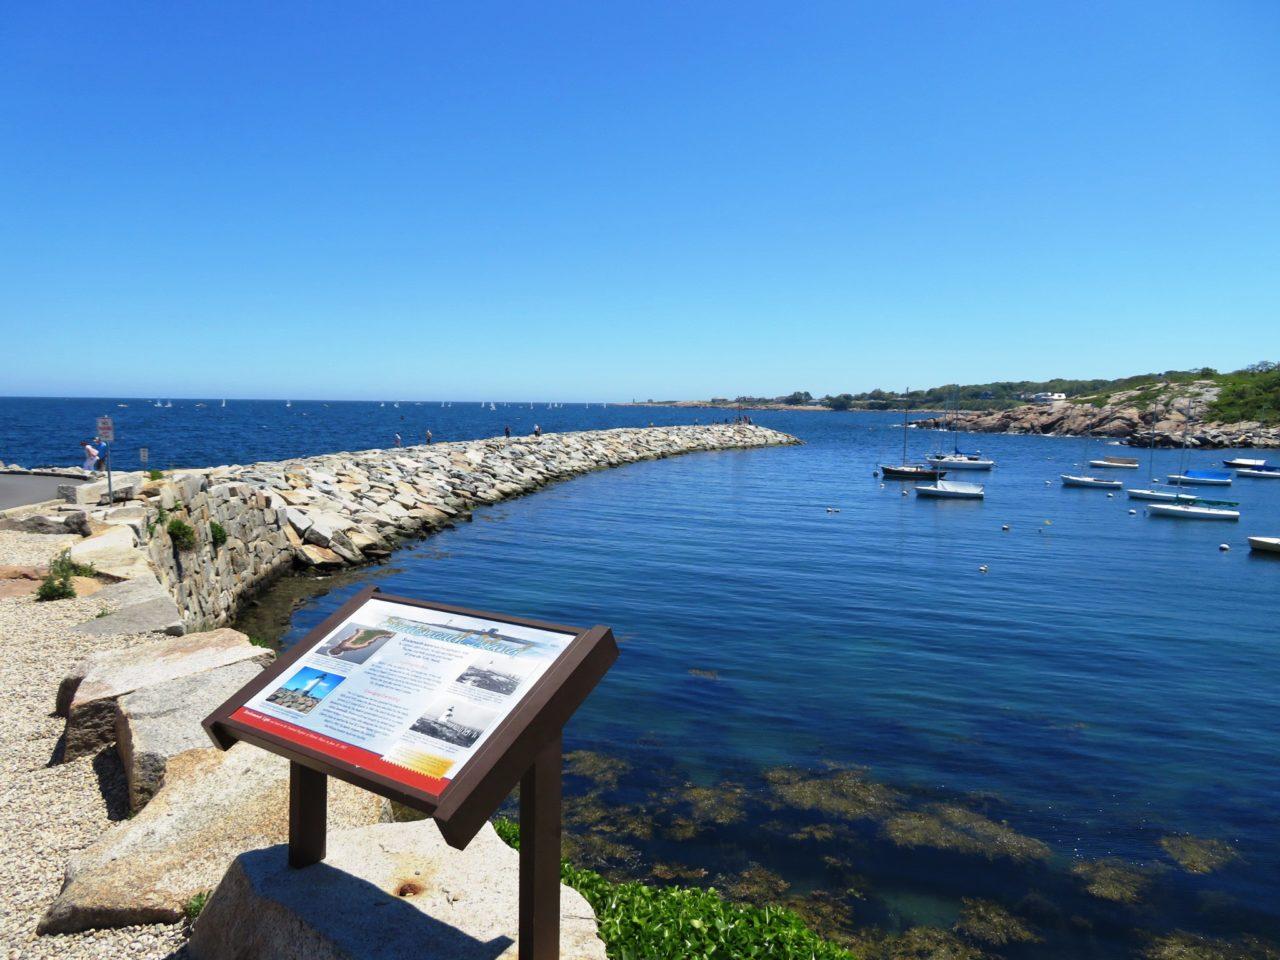 Emerson Inn by the Sea : Sailing Regatta in Rockport MA